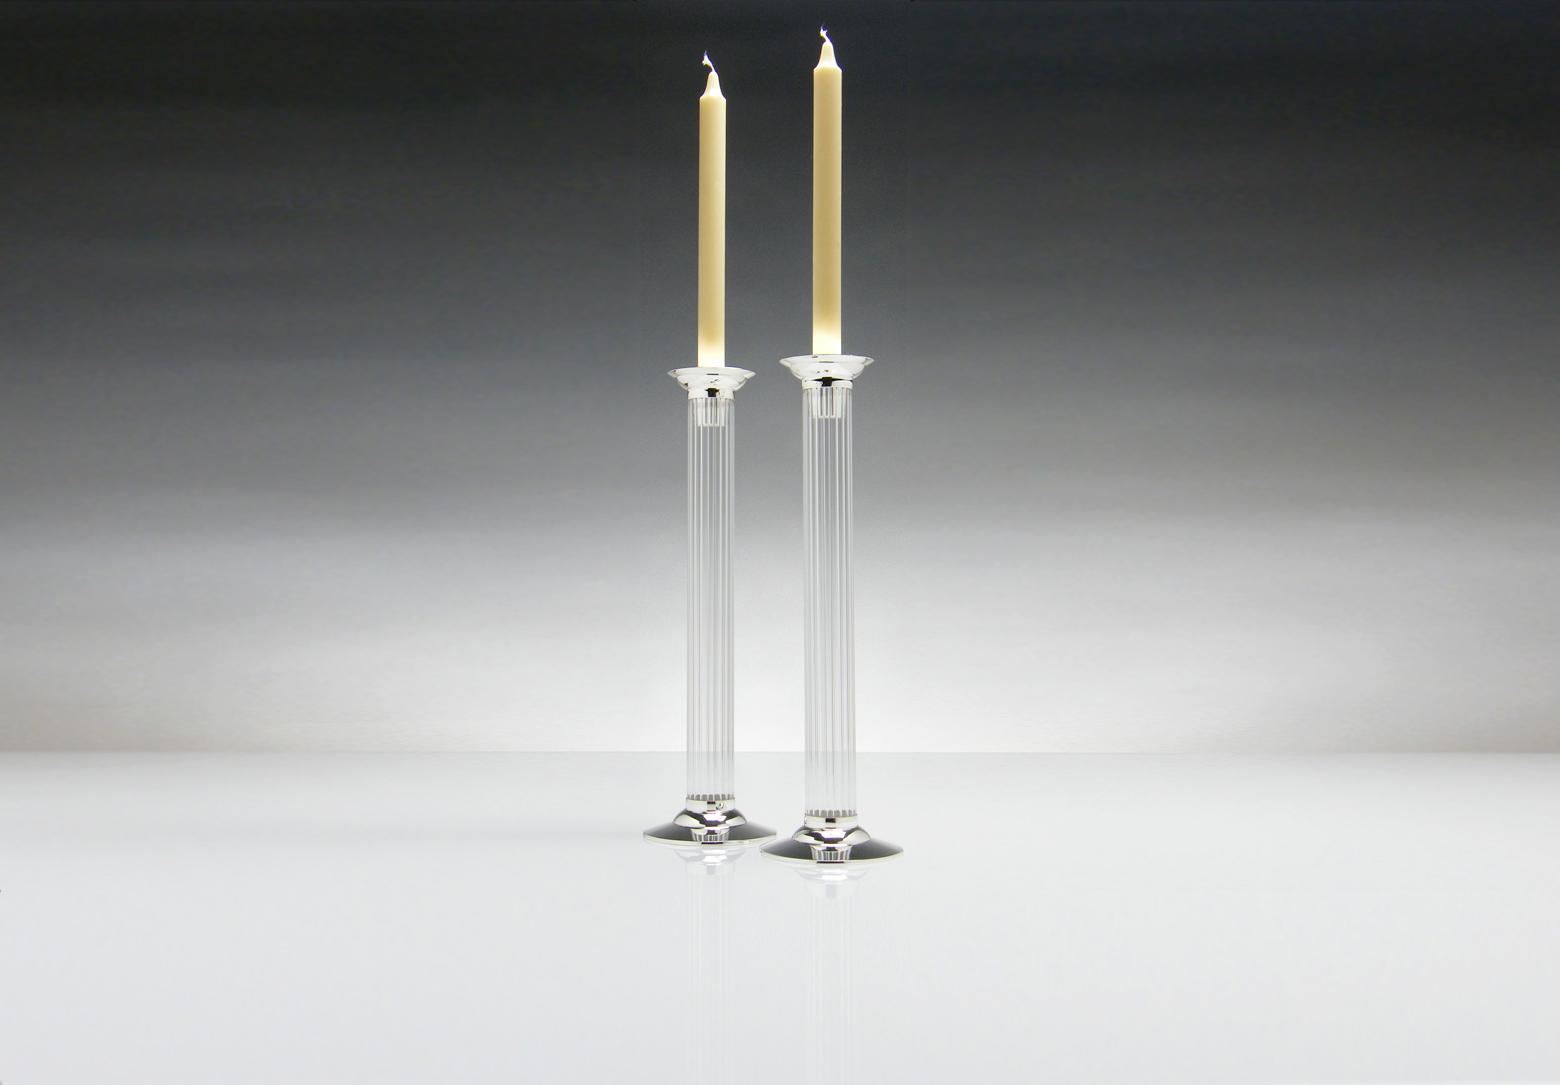 contemporary silverware - flute' tall candlesticks contemporary silverware by martyn pugh